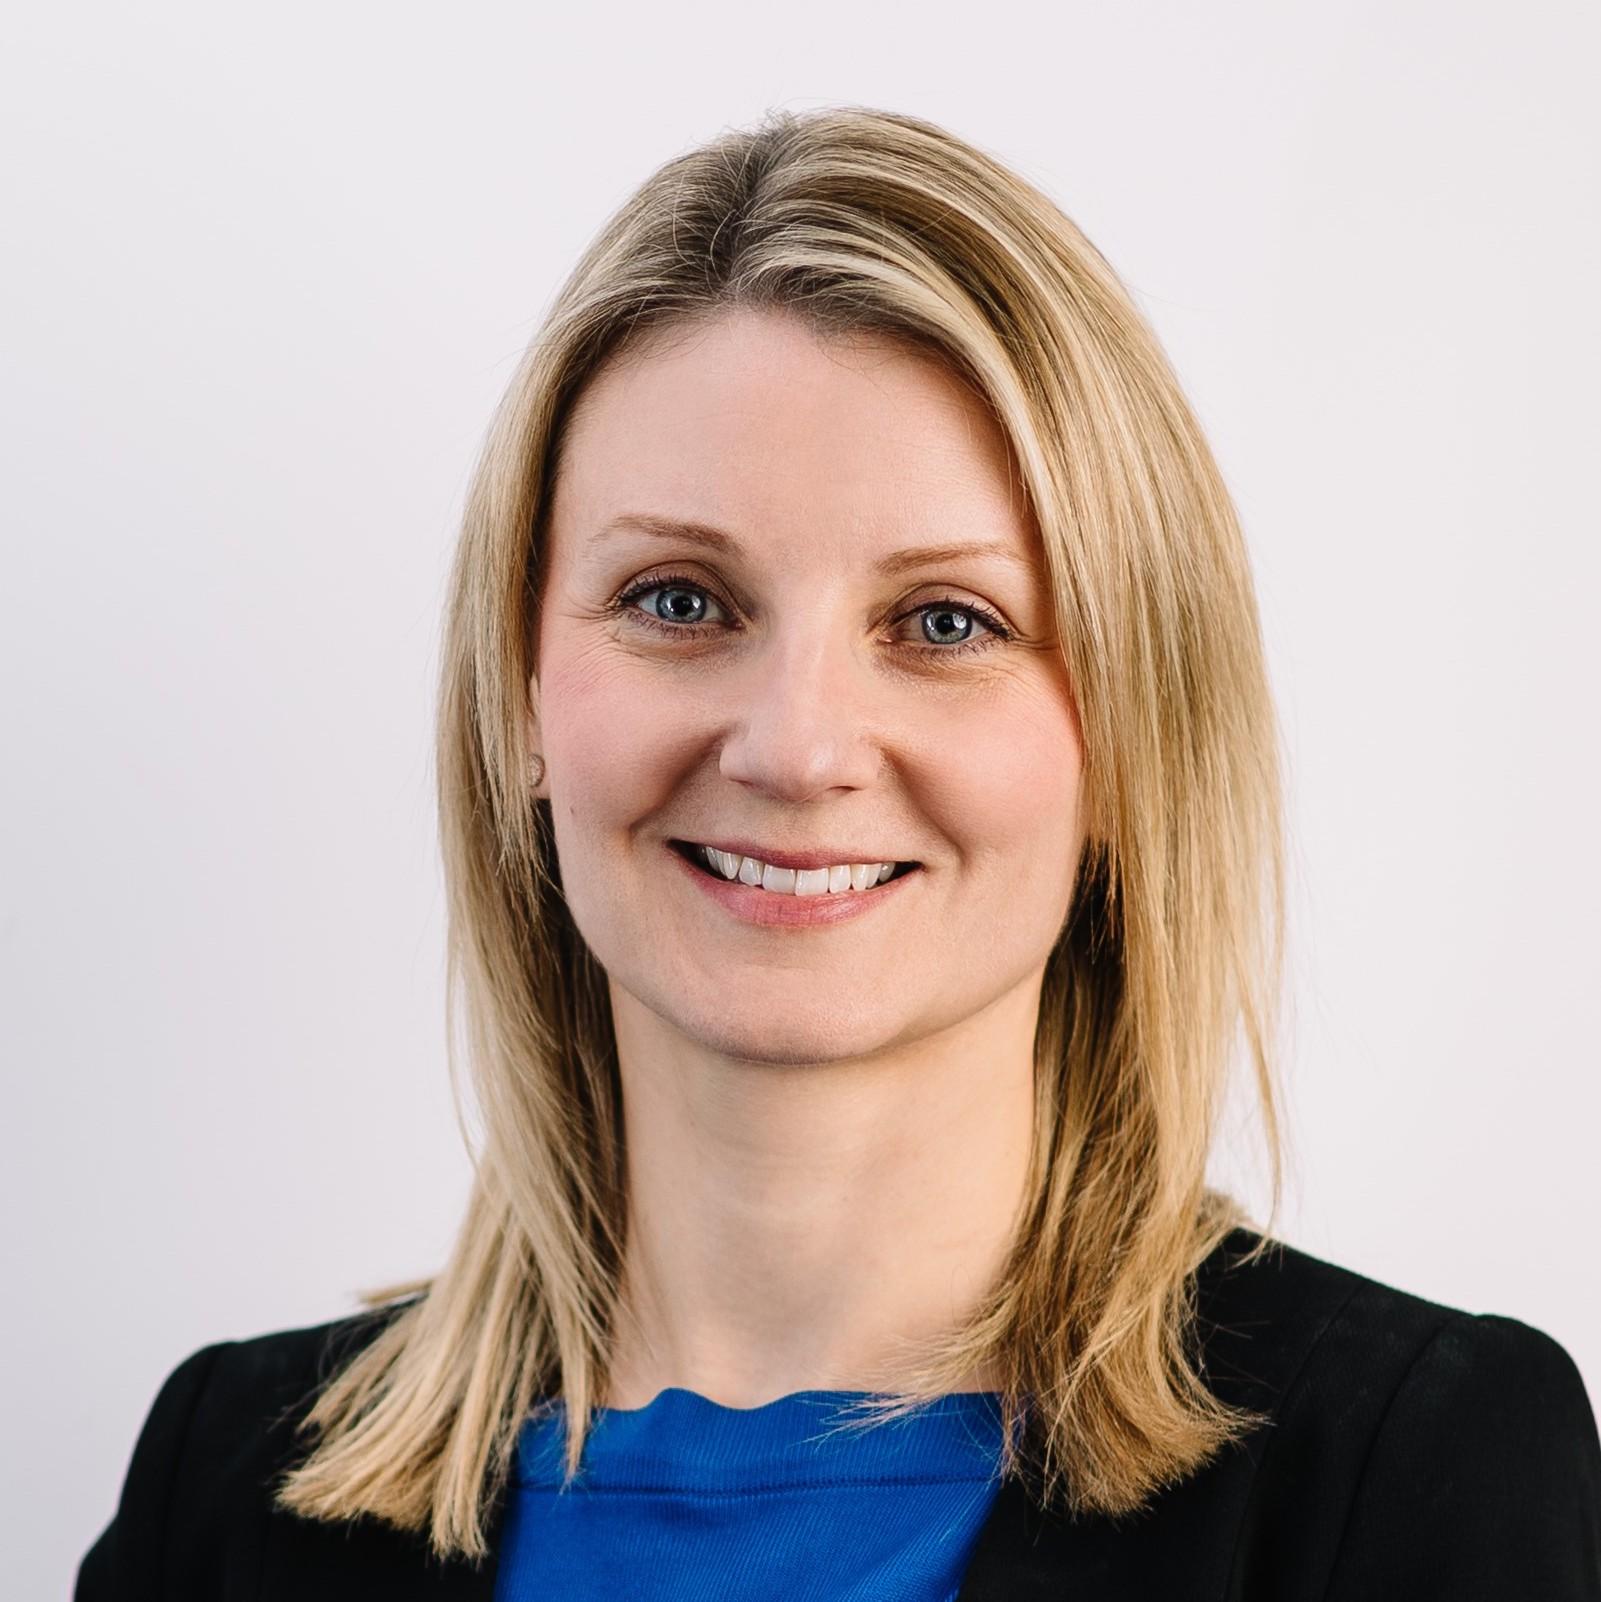 Amy Gough, CIOB director for membership